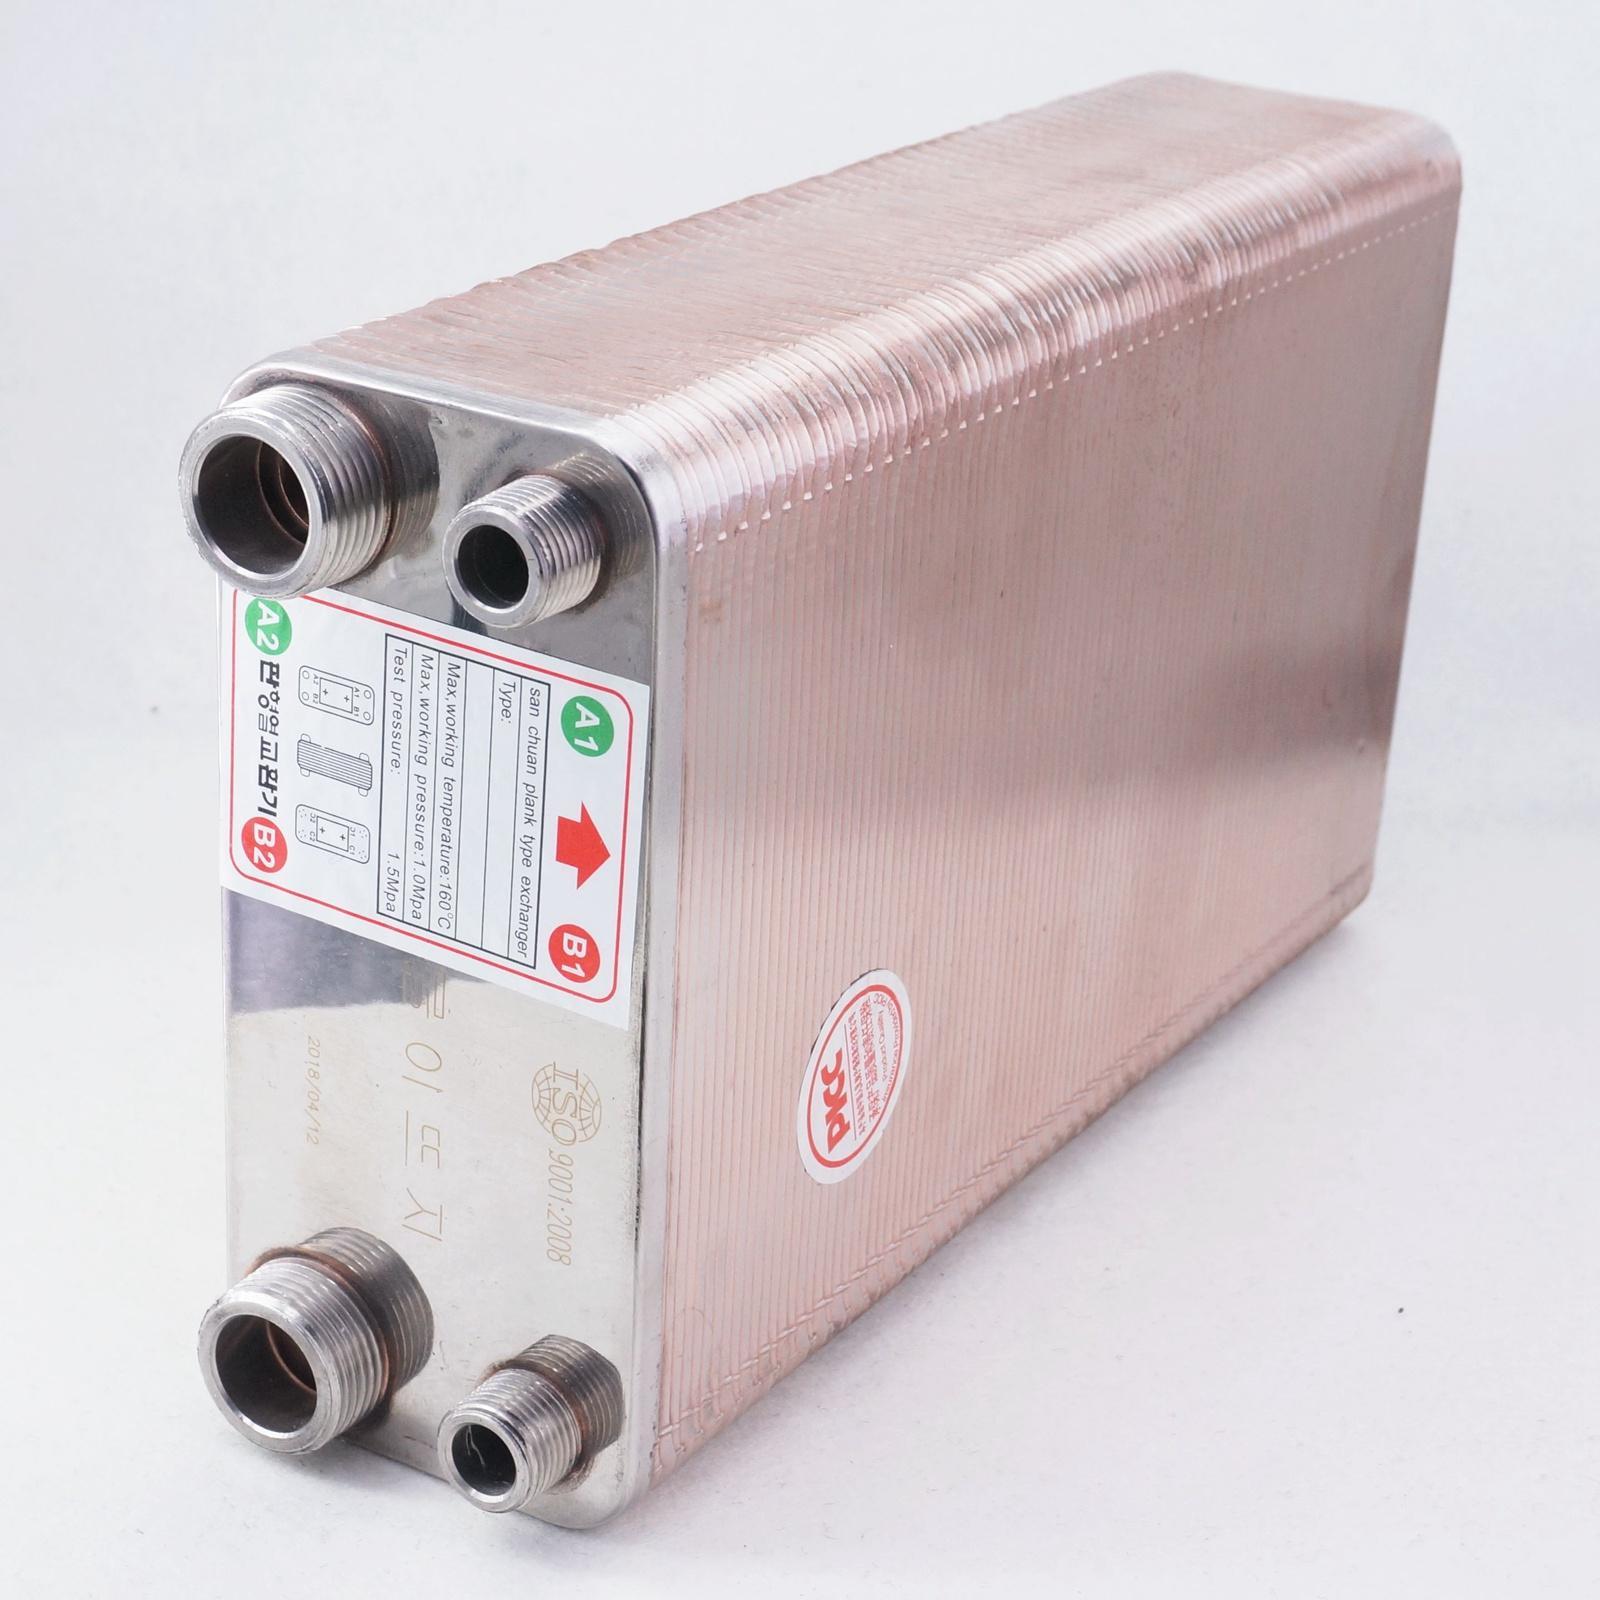 hot 100 Plates Wort Chiller Cooler Heat Exchanger SUS 304 Stainless Steel Home Brew Beer Wine Making